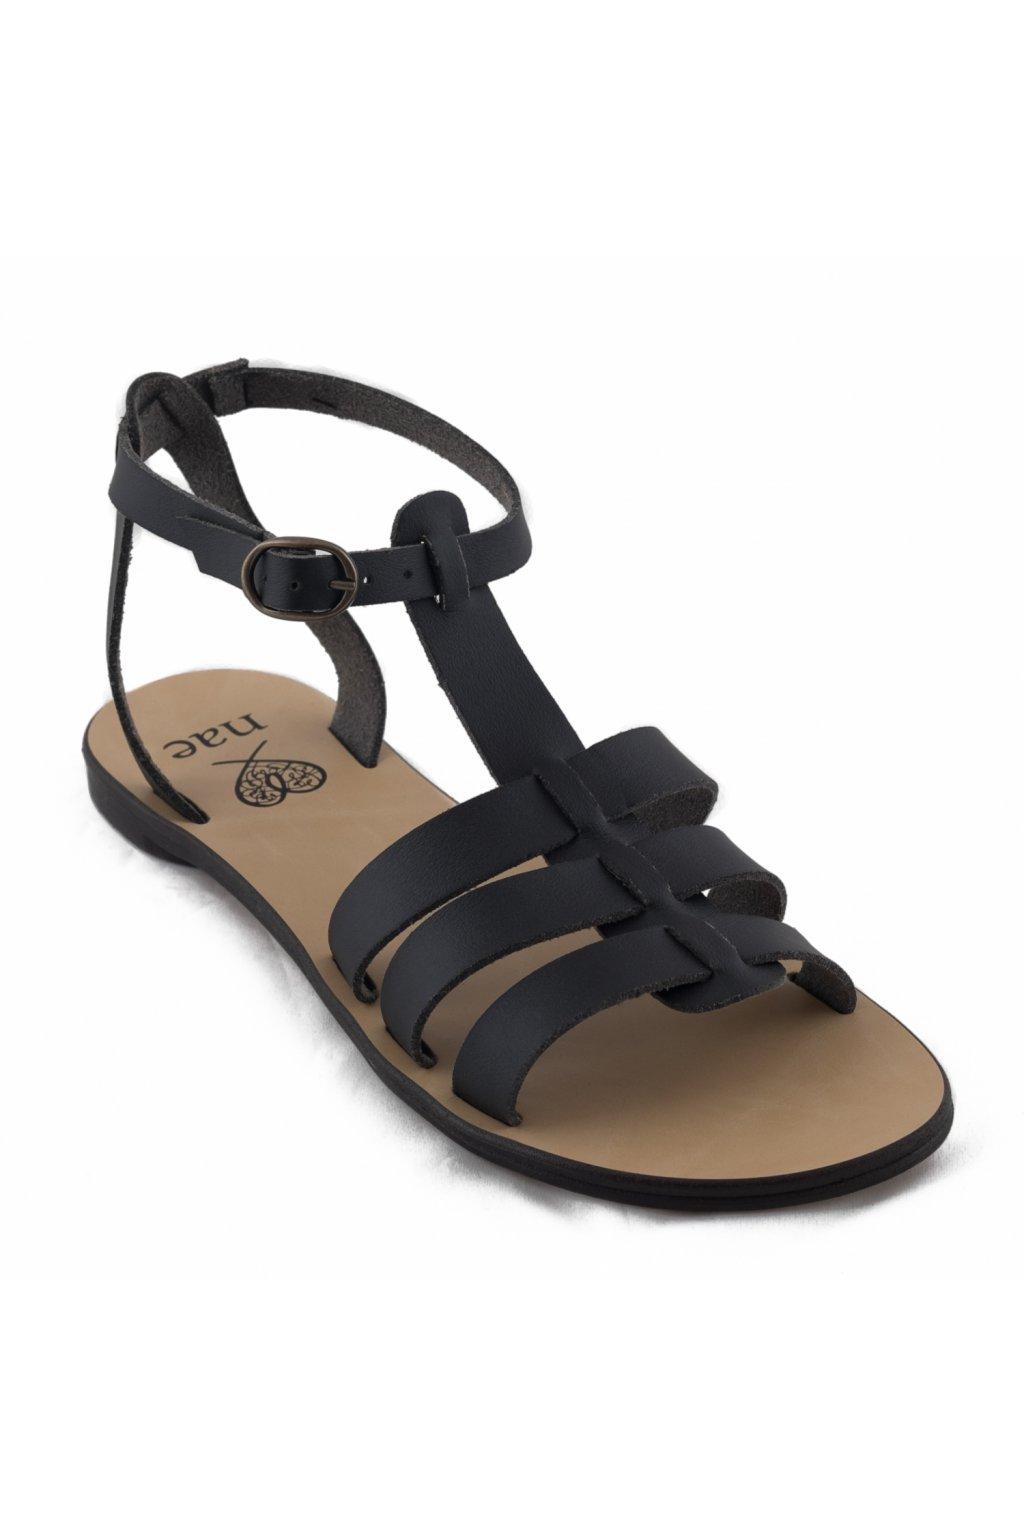 "Dámske čierne sandálky ""Doria"""